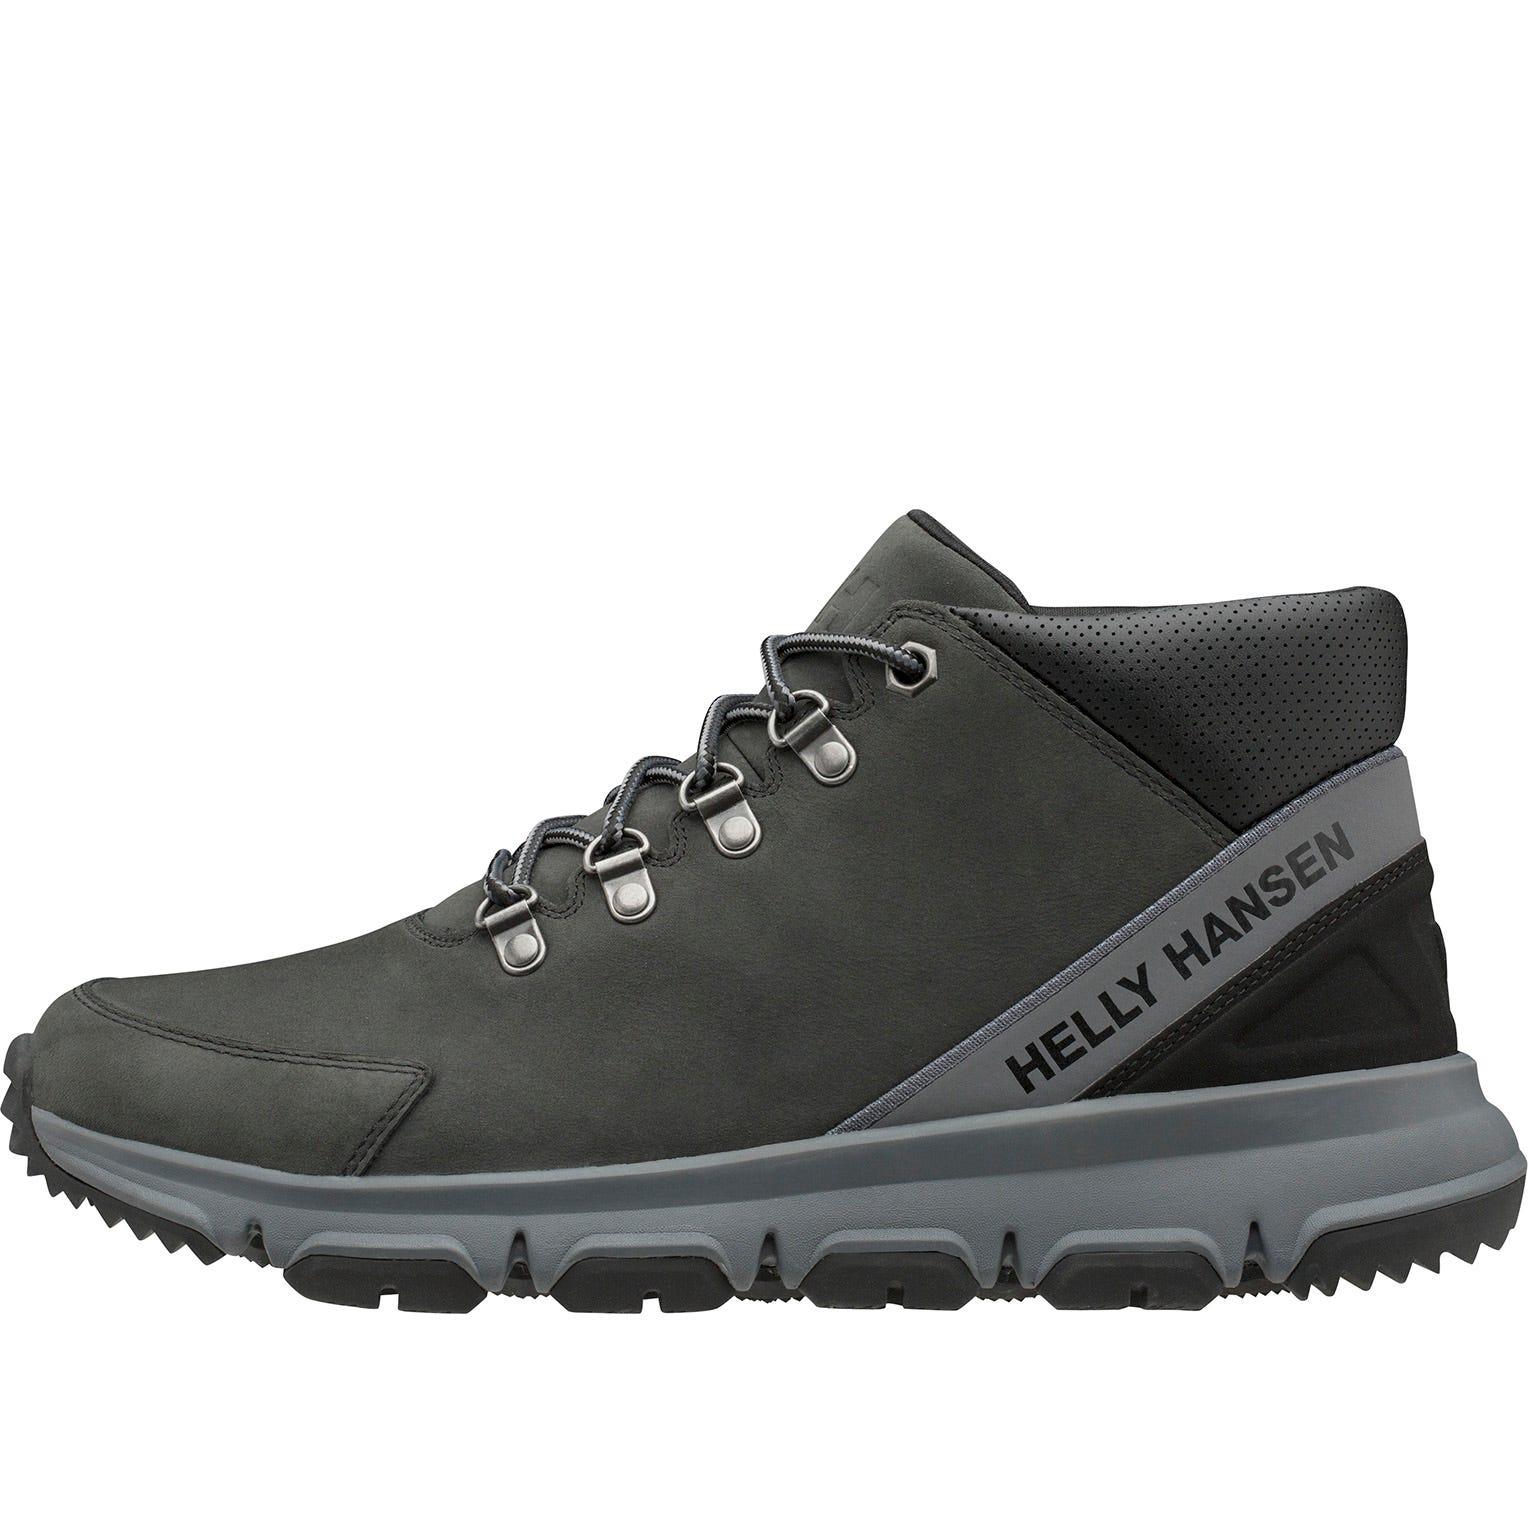 Helly Hansen Fendvard Boot Mens Winter Yellow 42.5/9